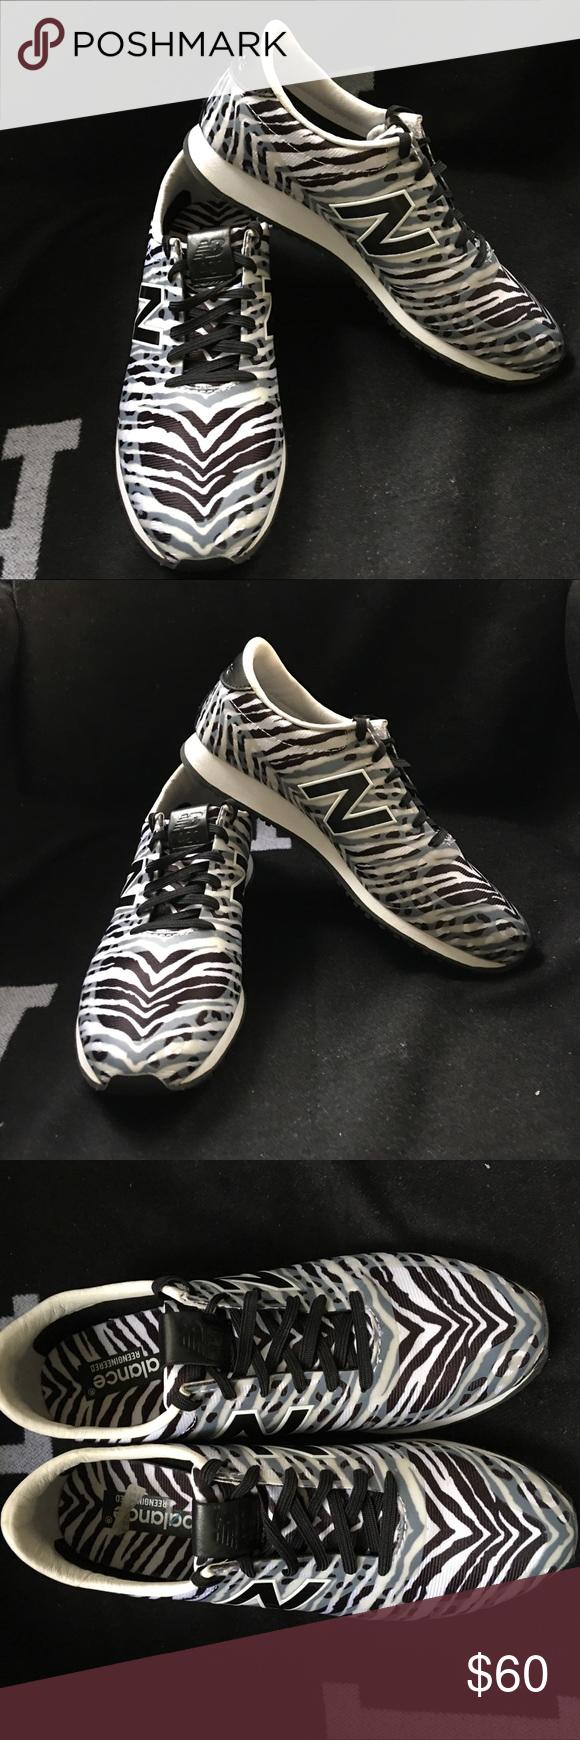 c12ee2630c0 New Balance 420 Black White Zebra 🦓 Print 7.5 M